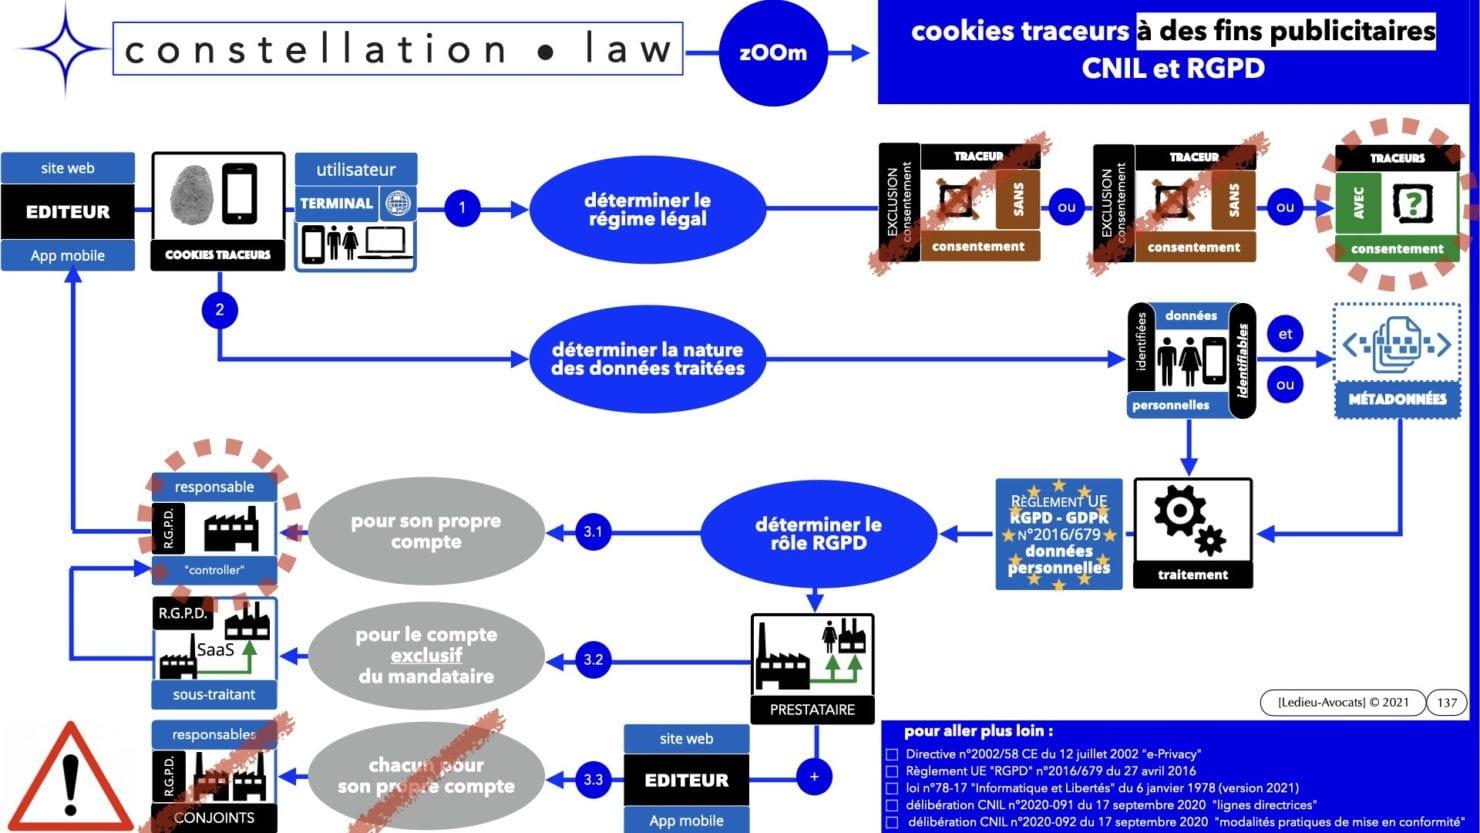 RGPD e-Privacy principes actualité jurisprudence ©Ledieu-Avocats 25-06-2021.137